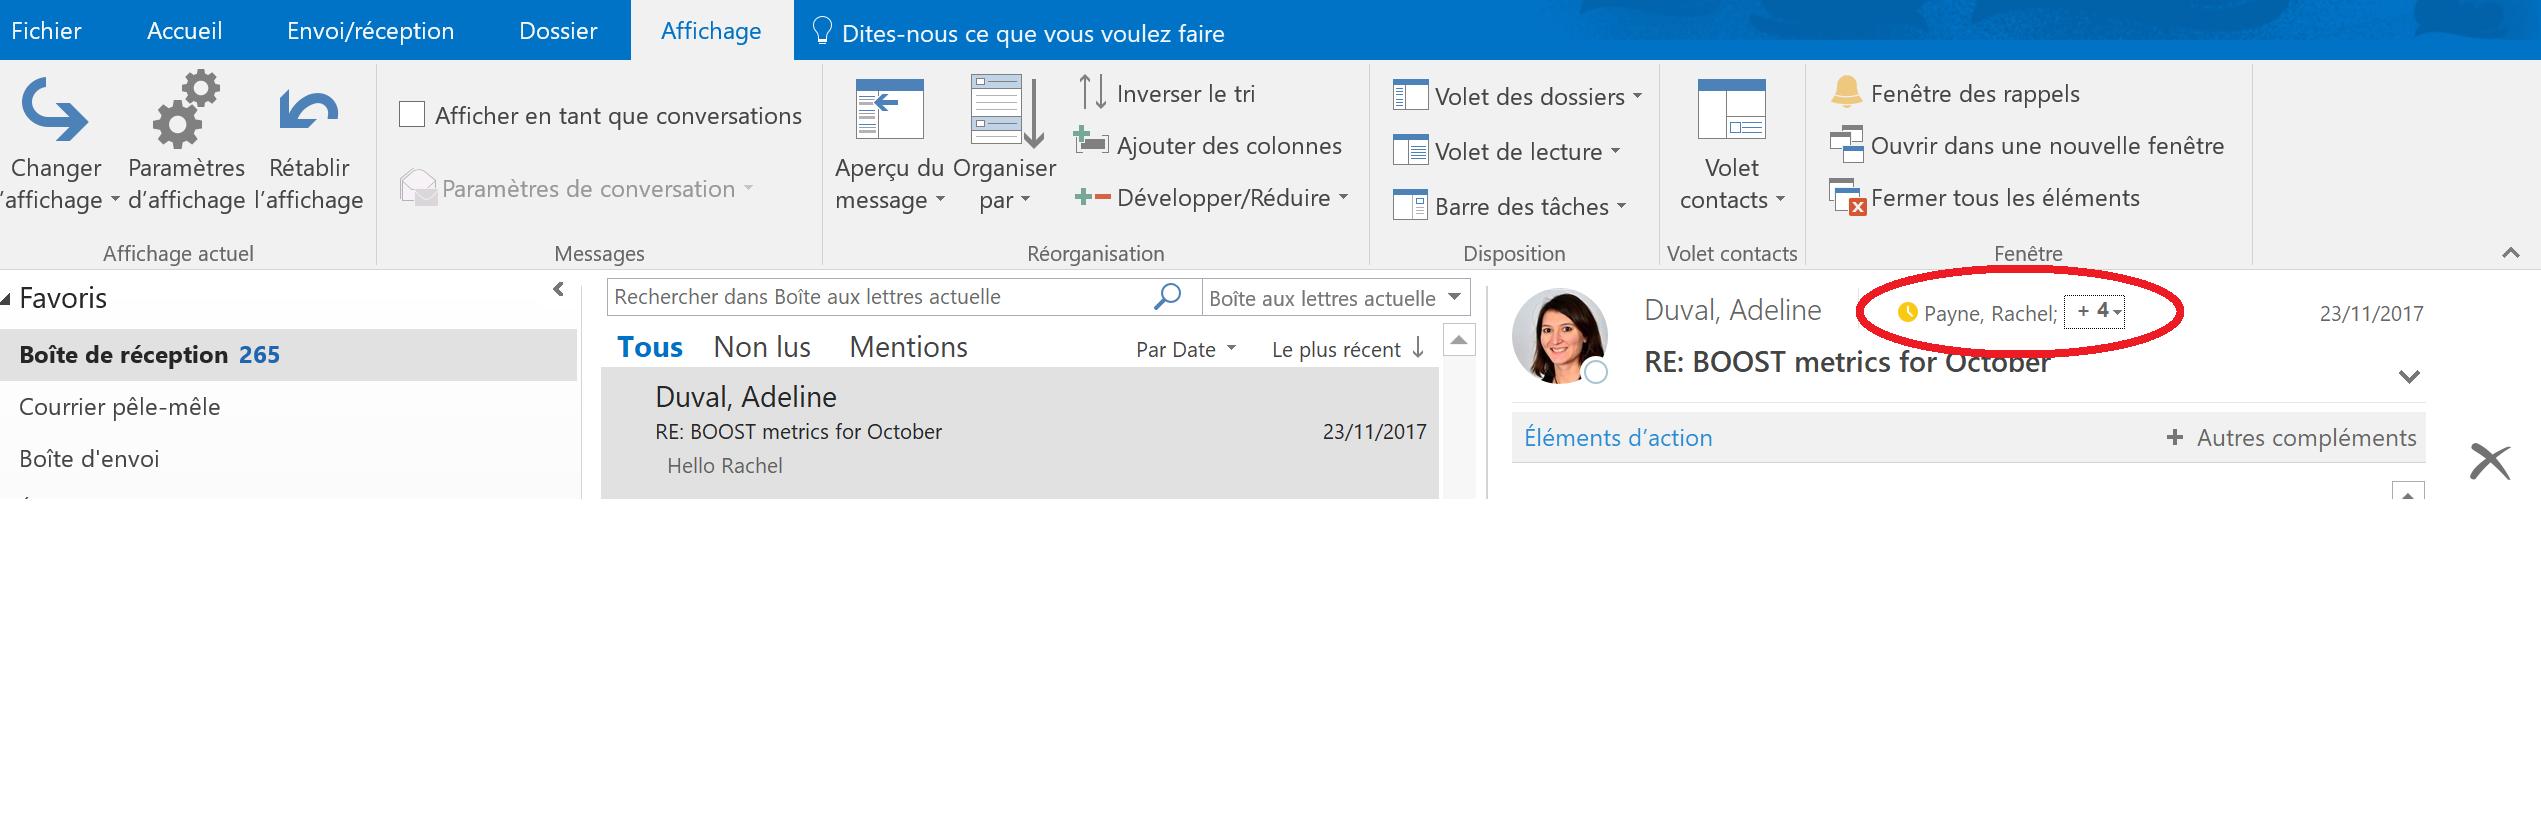 Nom : Outlook 1.png Affichages : 265 Taille : 145,4 Ko